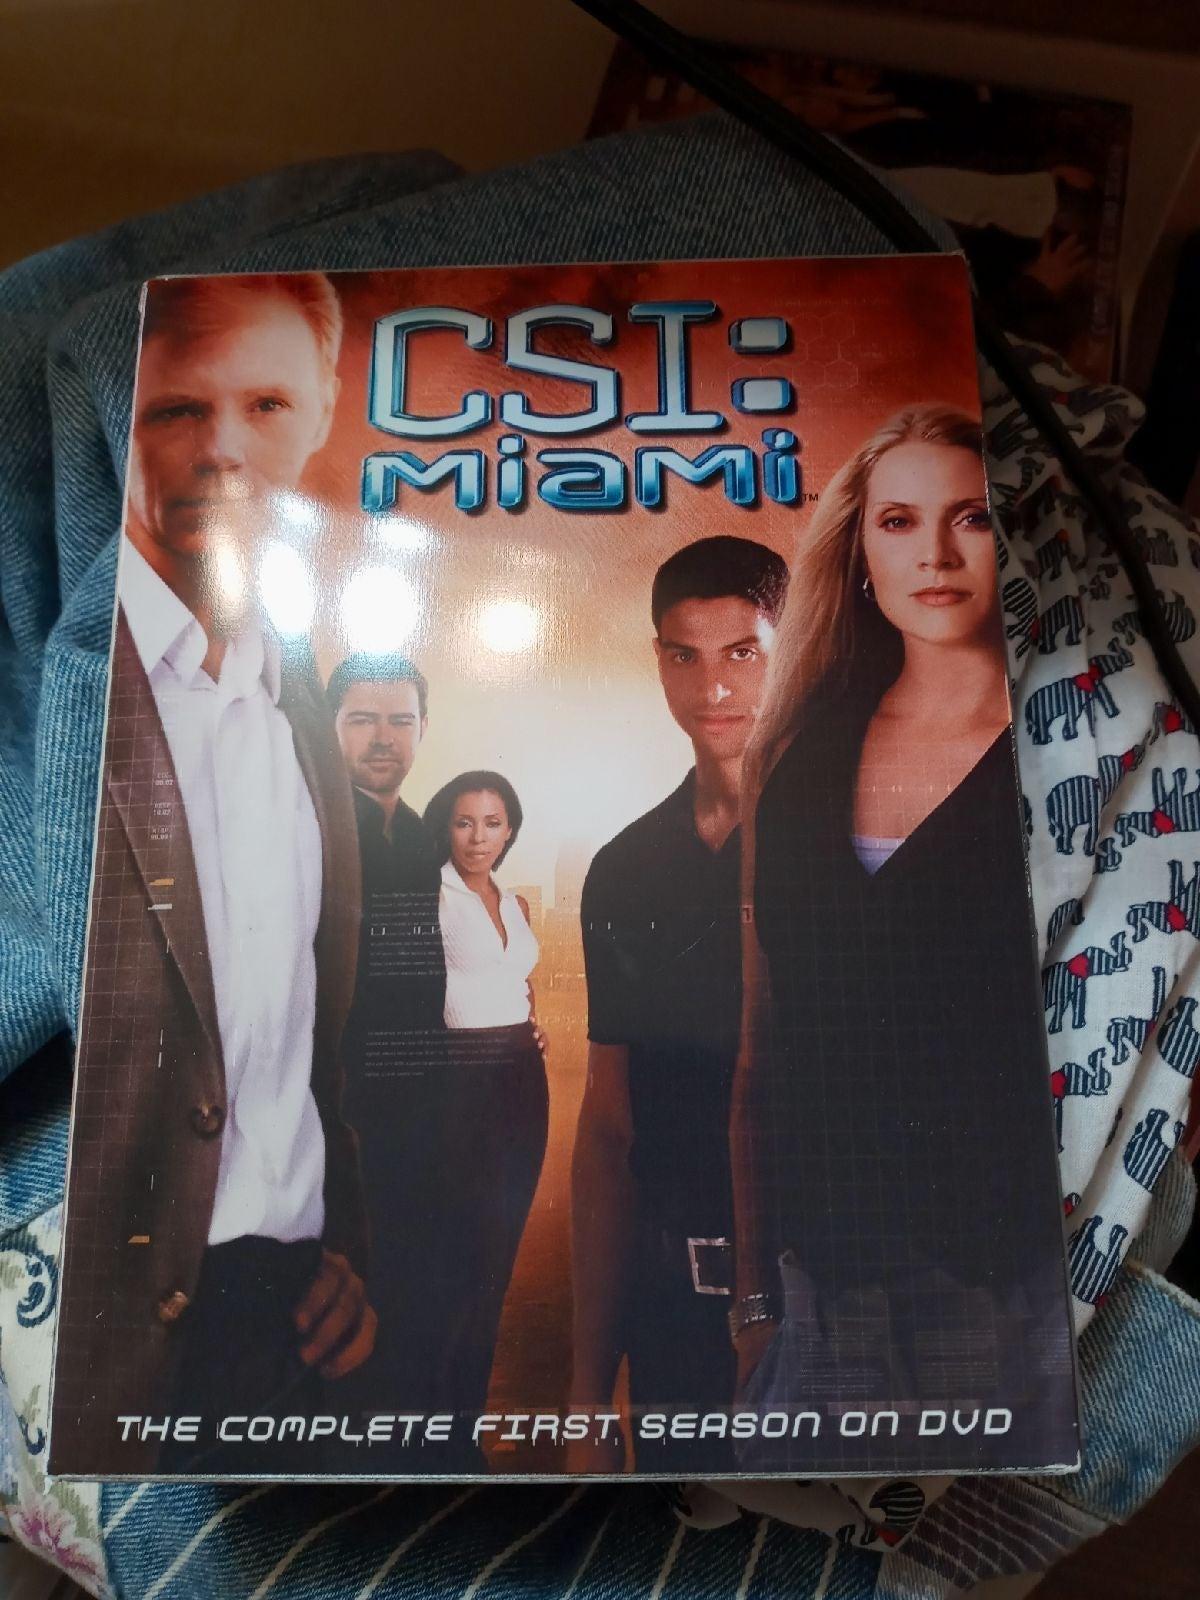 CSI Miami Seasons 1, 2, and 3: Complete